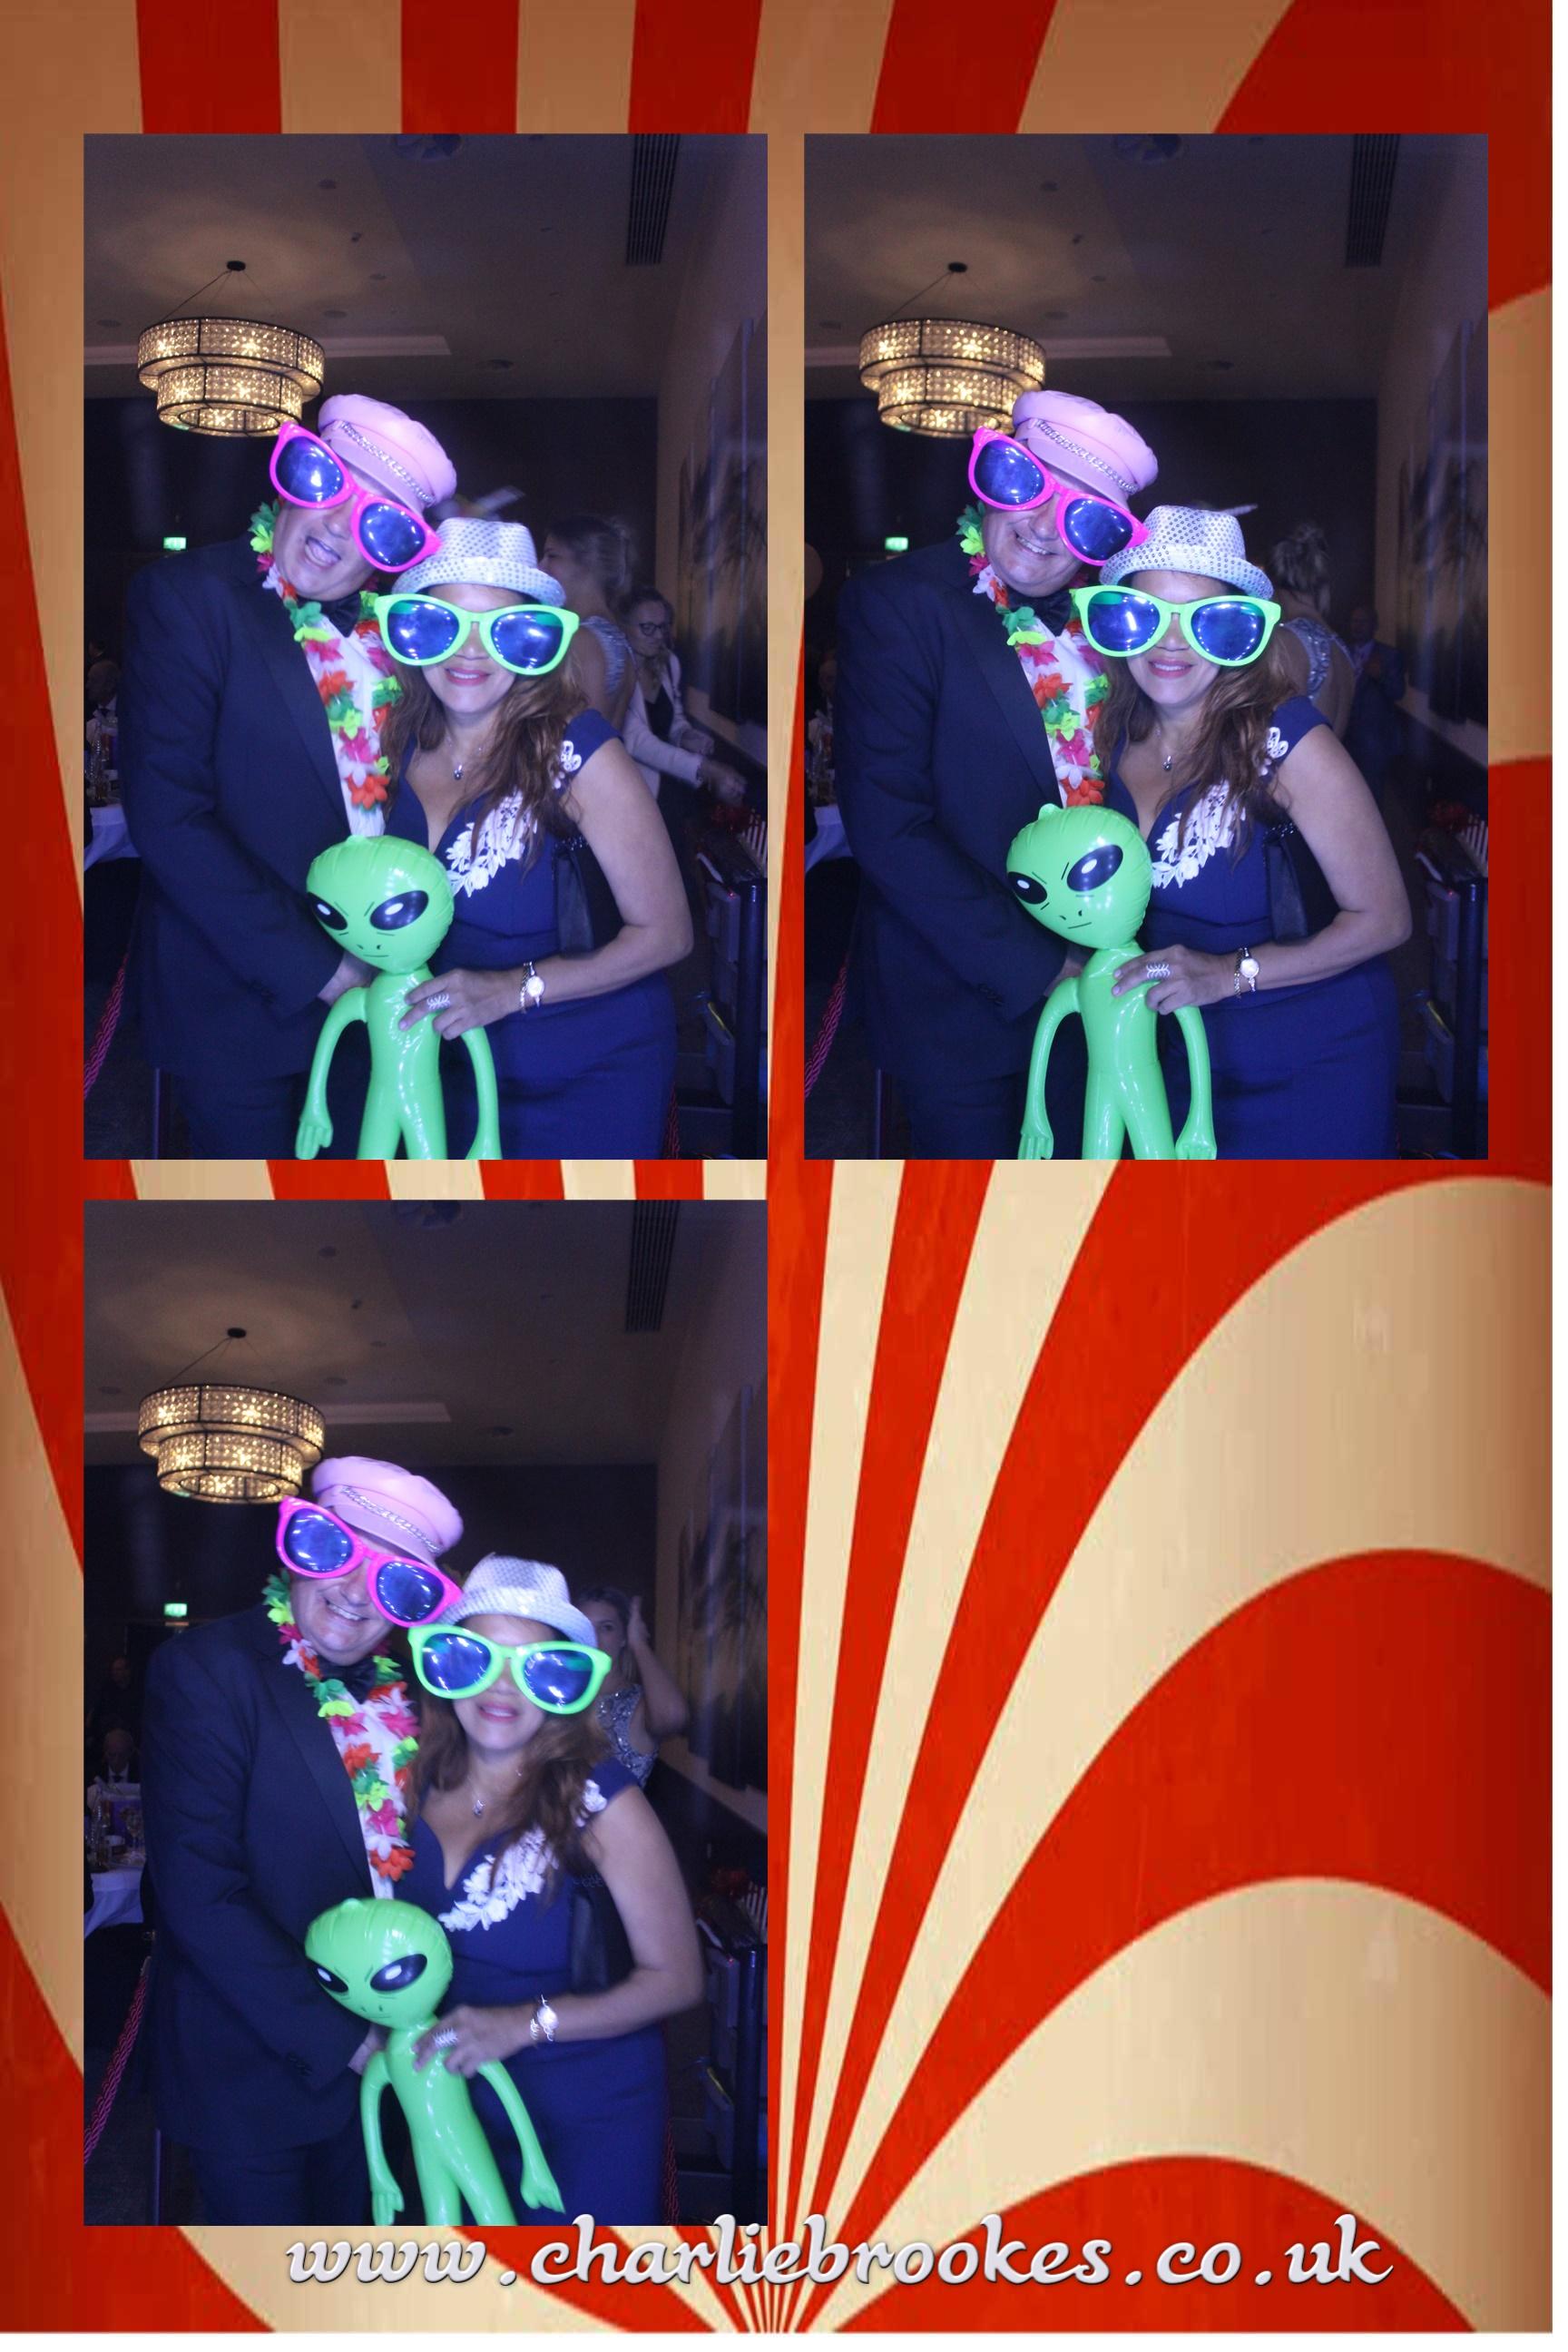 Carnival themed multi shot te,plate